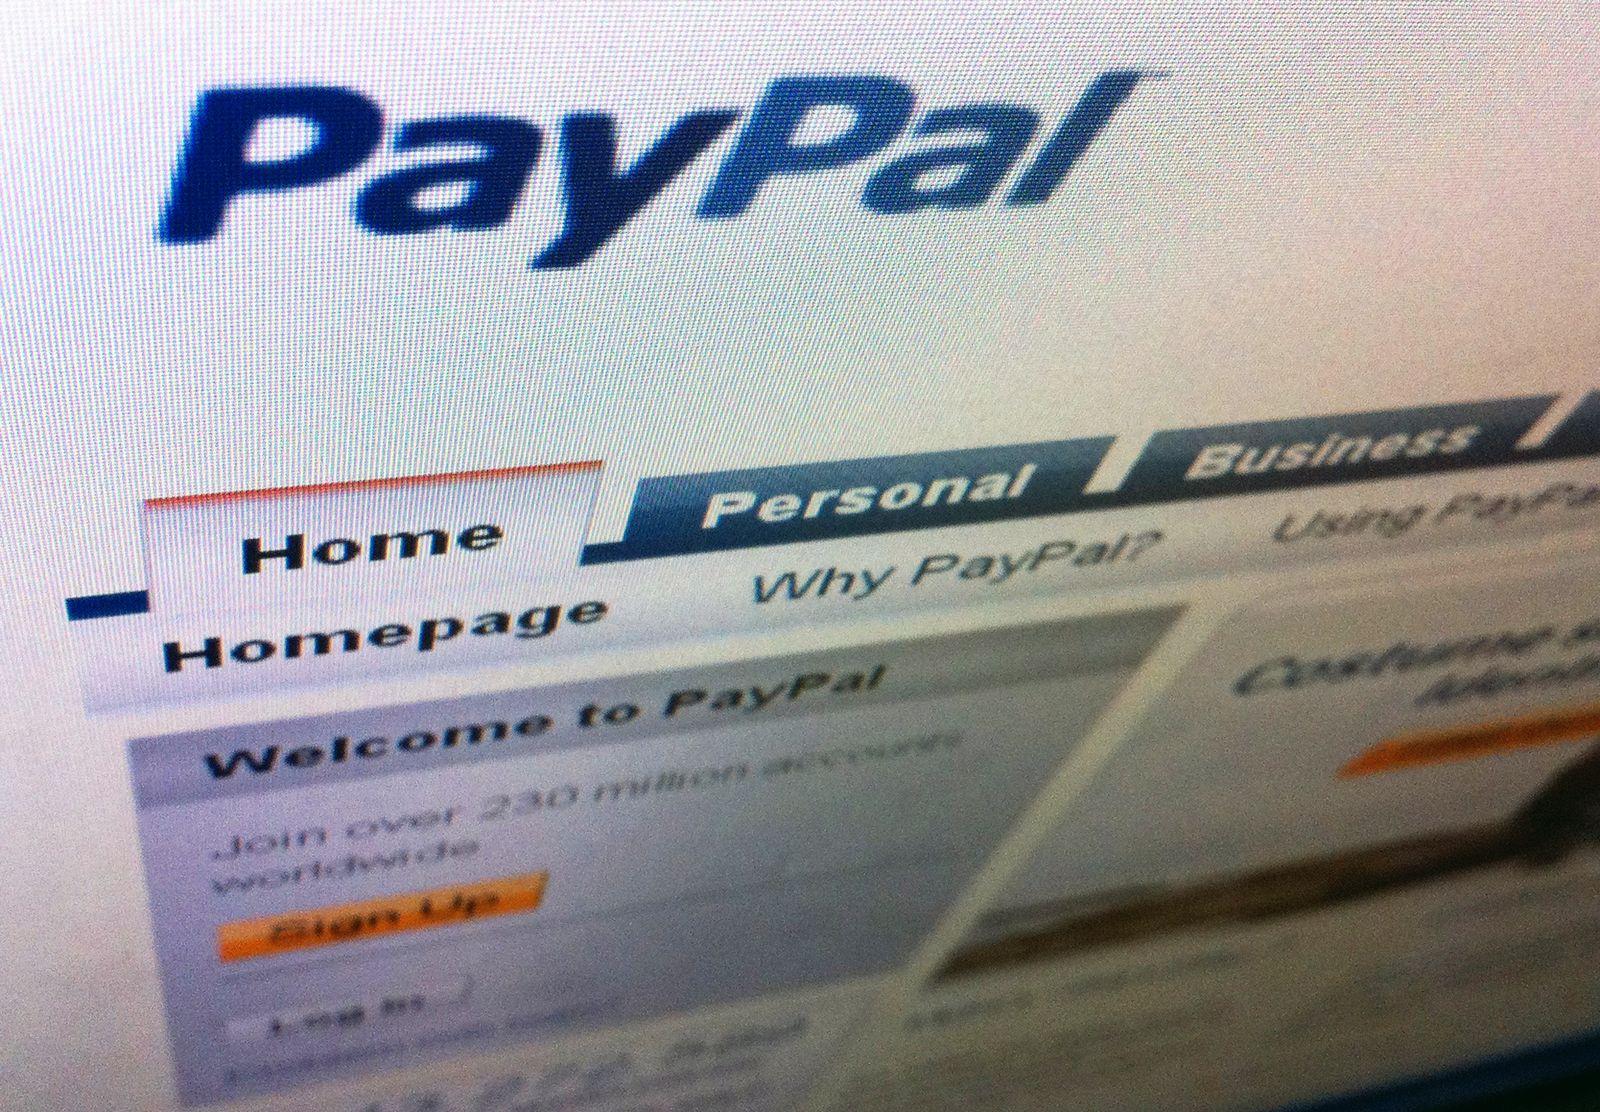 PayPal / Symboöbild